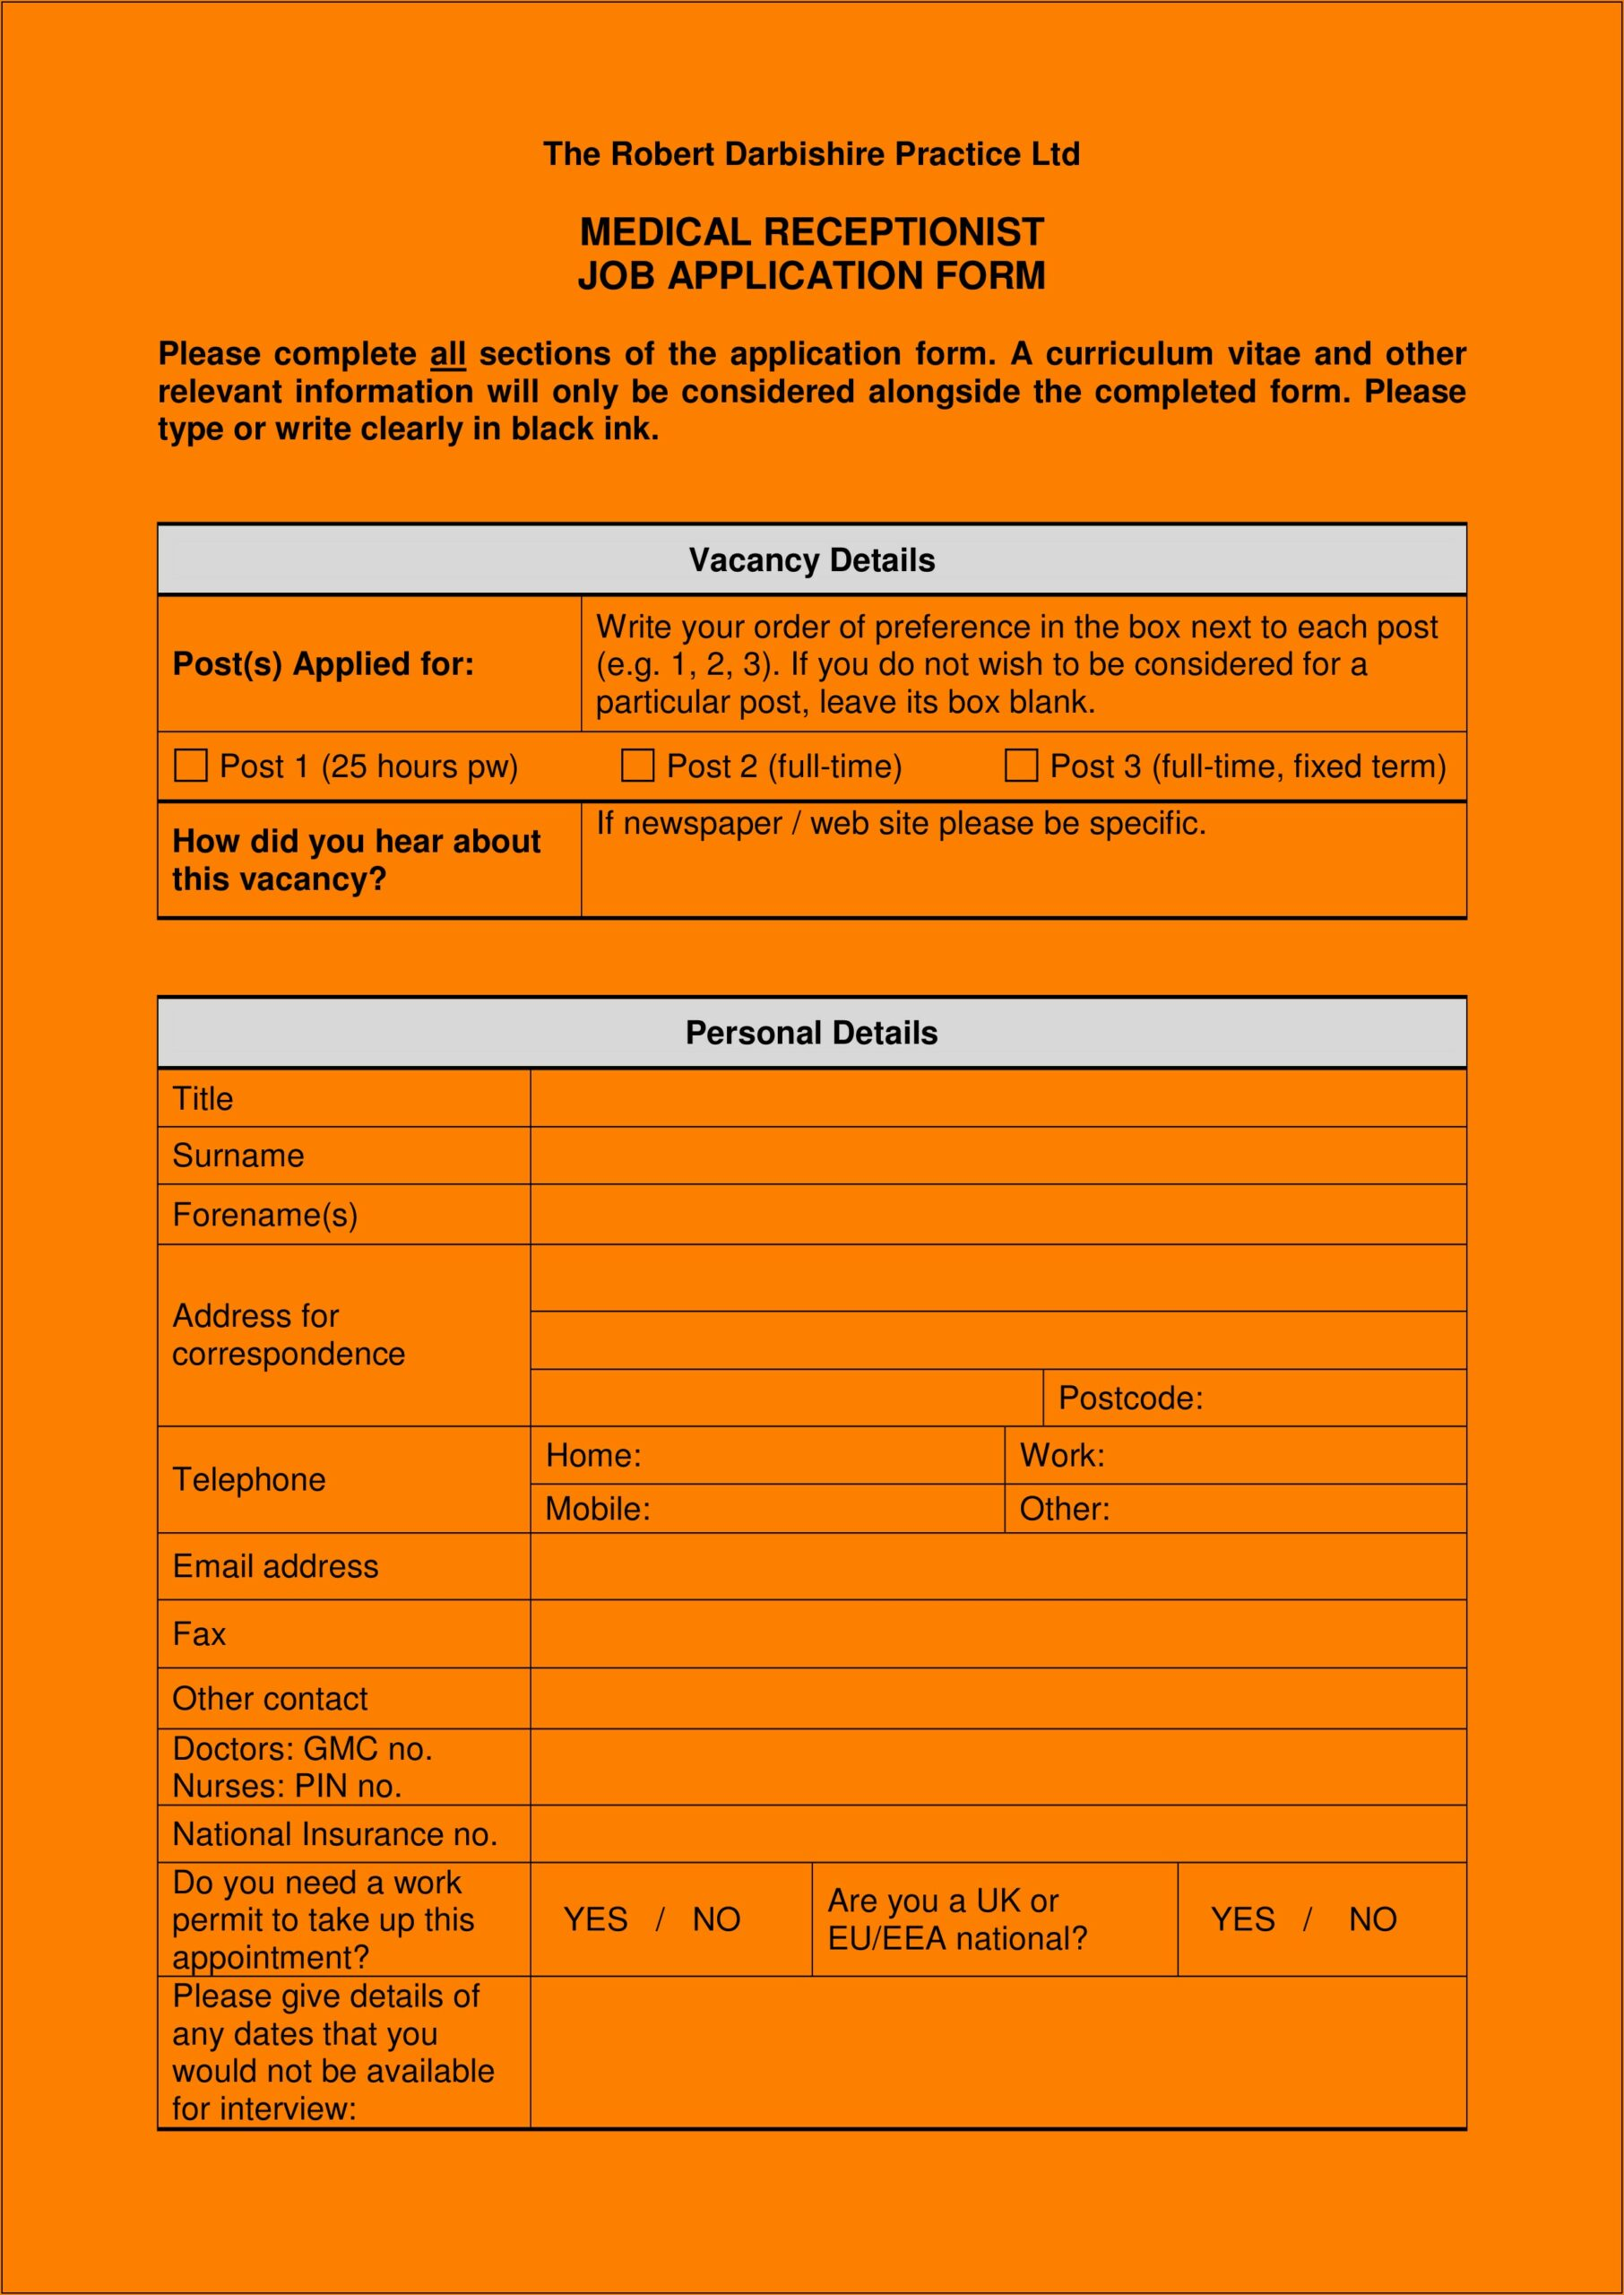 Medical Receptionist Application Form